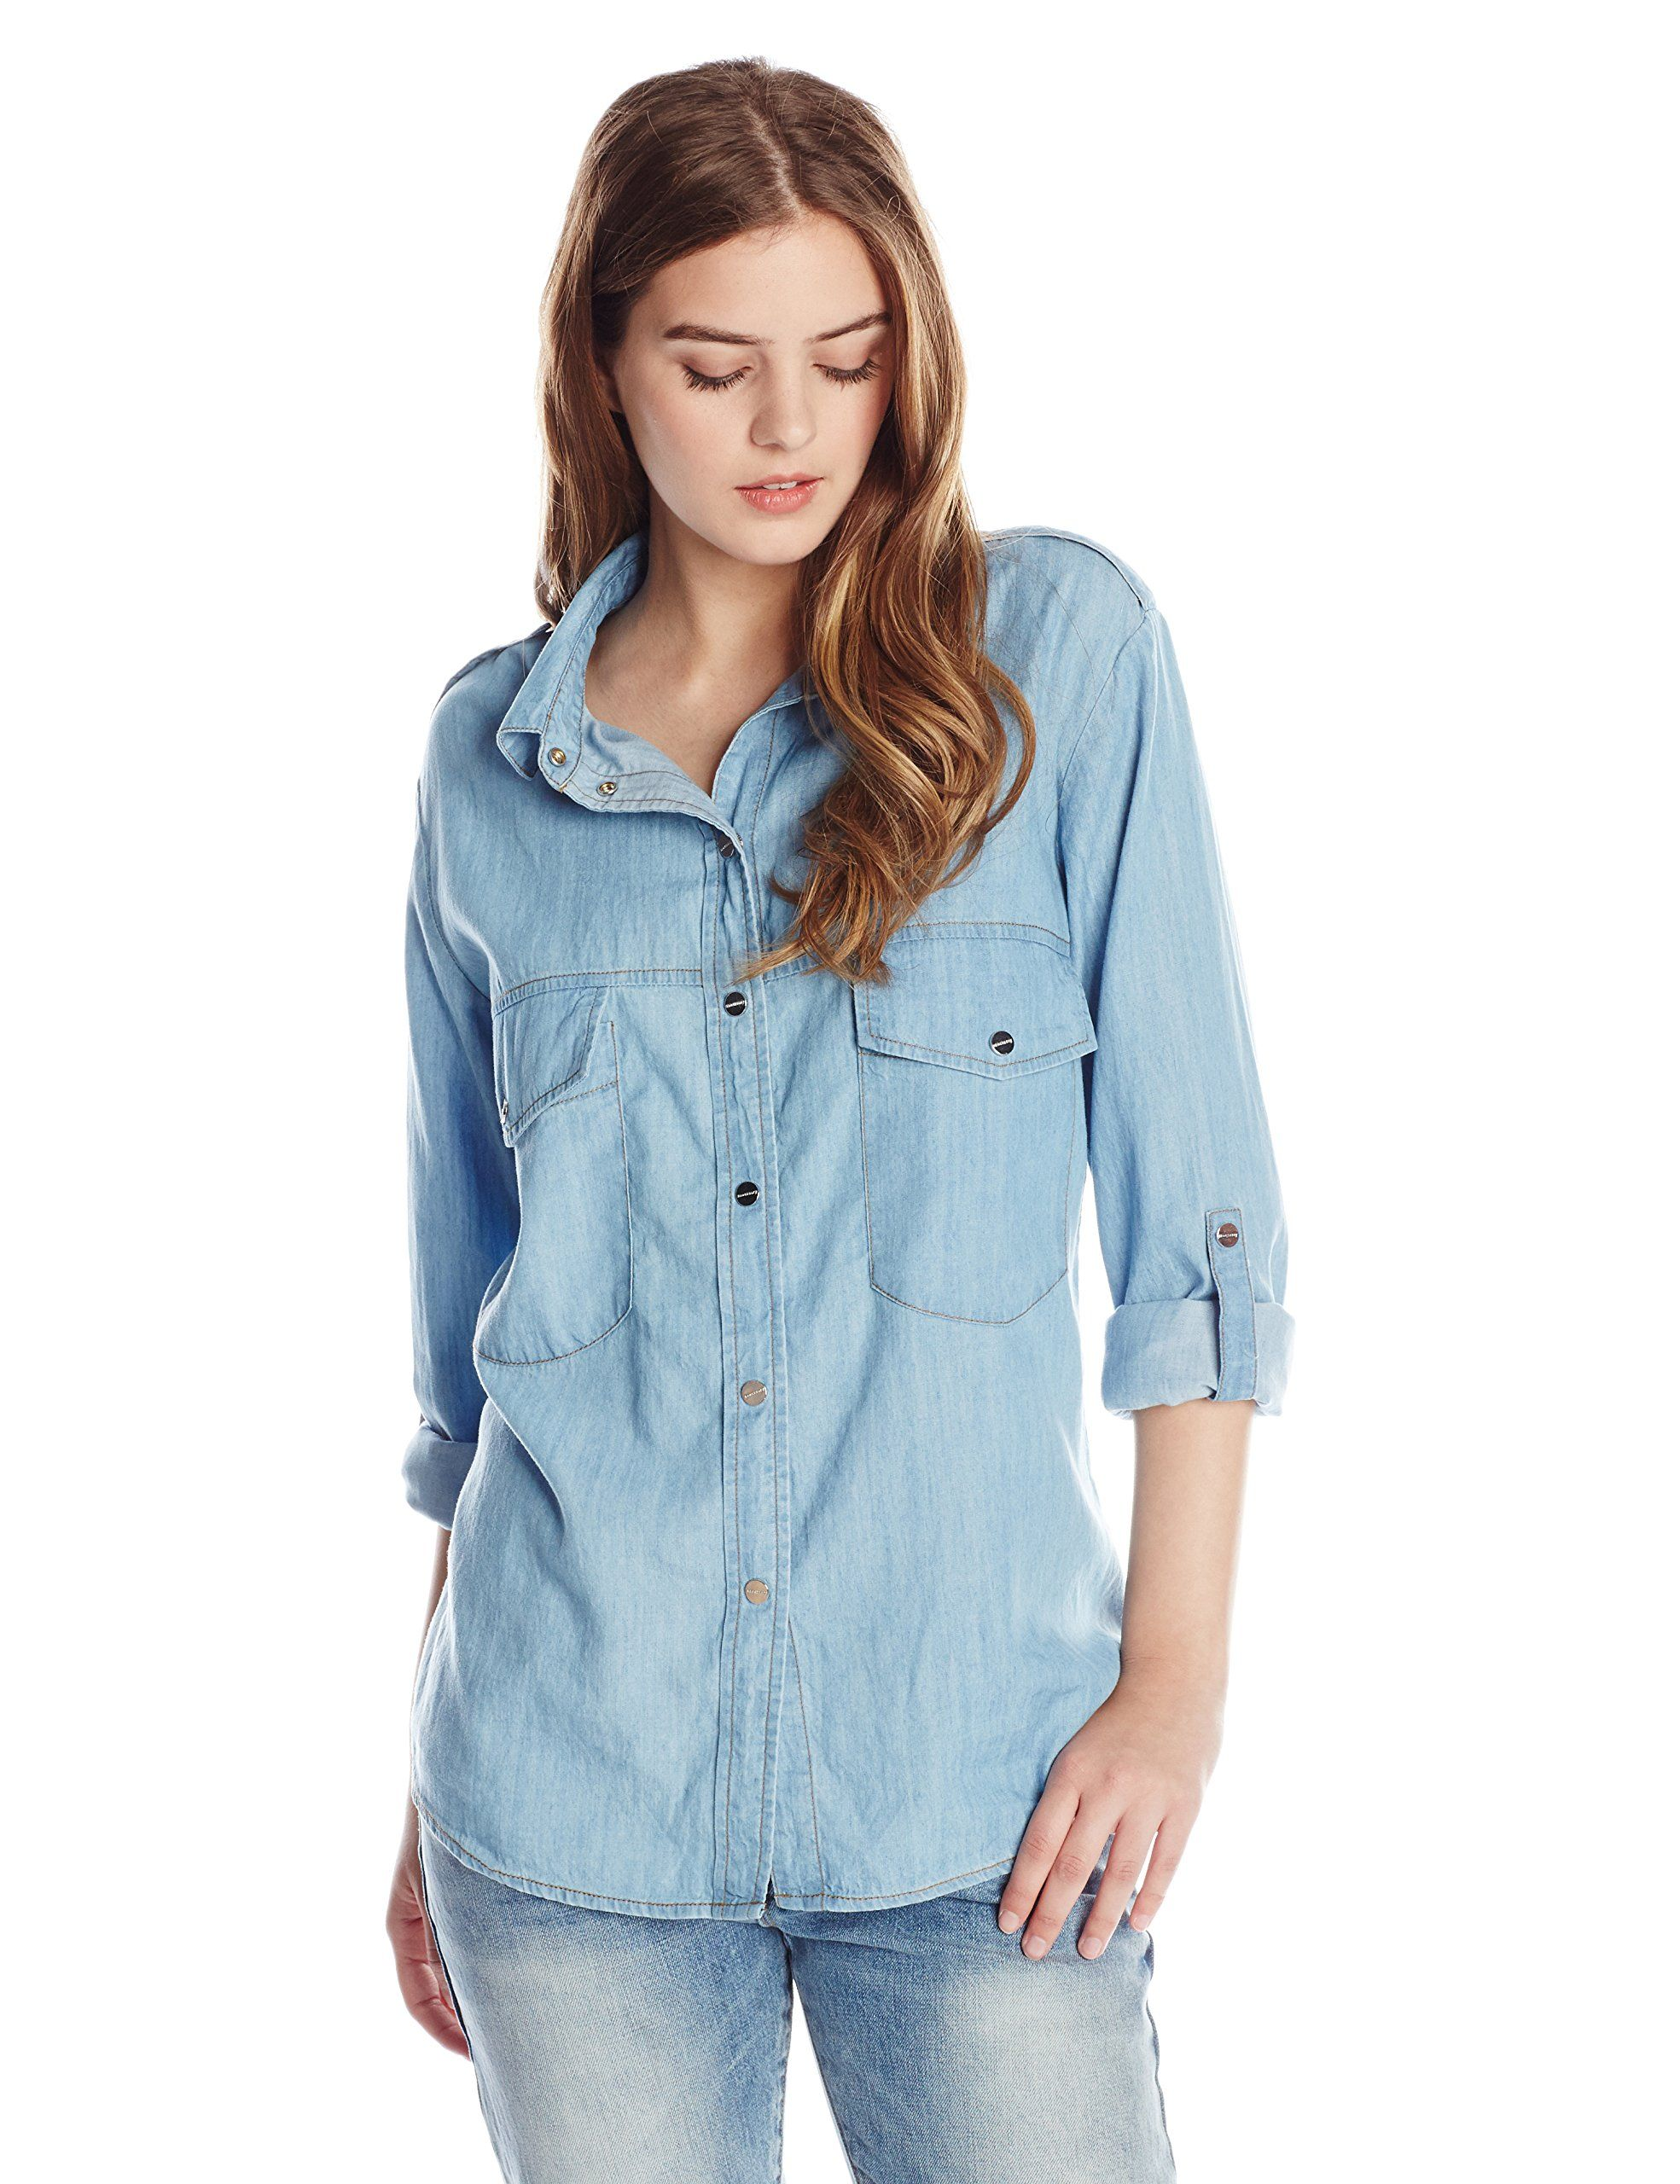 2a54cebfb6 Sanctuary Clothing Women s Boyfriend Denim Tencel Shirt